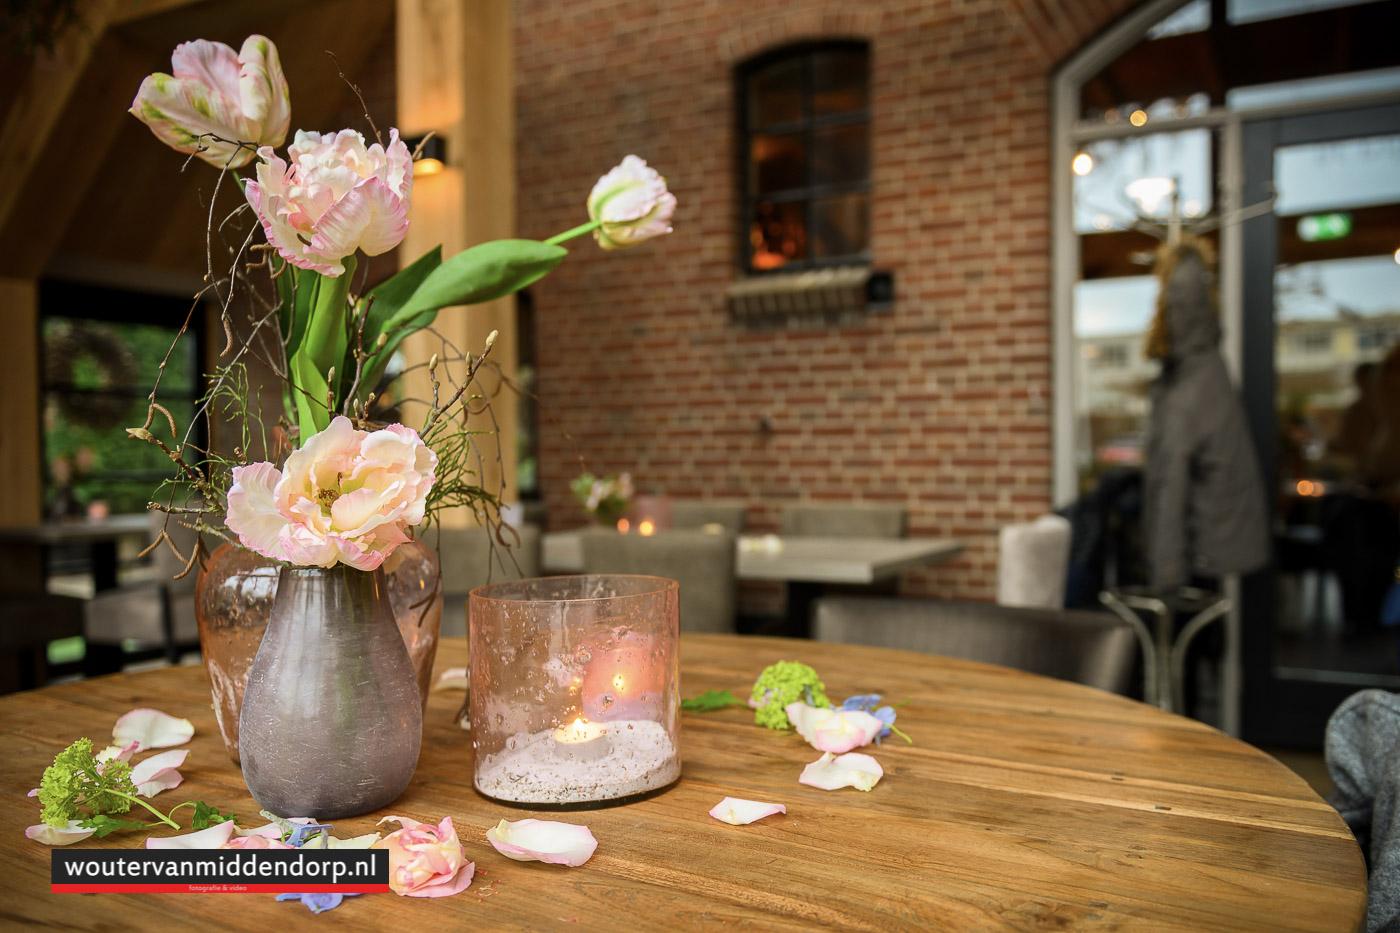 bruidsfotografie Wouter van Middendorp Uddel Elspeet Barneveld, omgeving trouwfotograaf-21